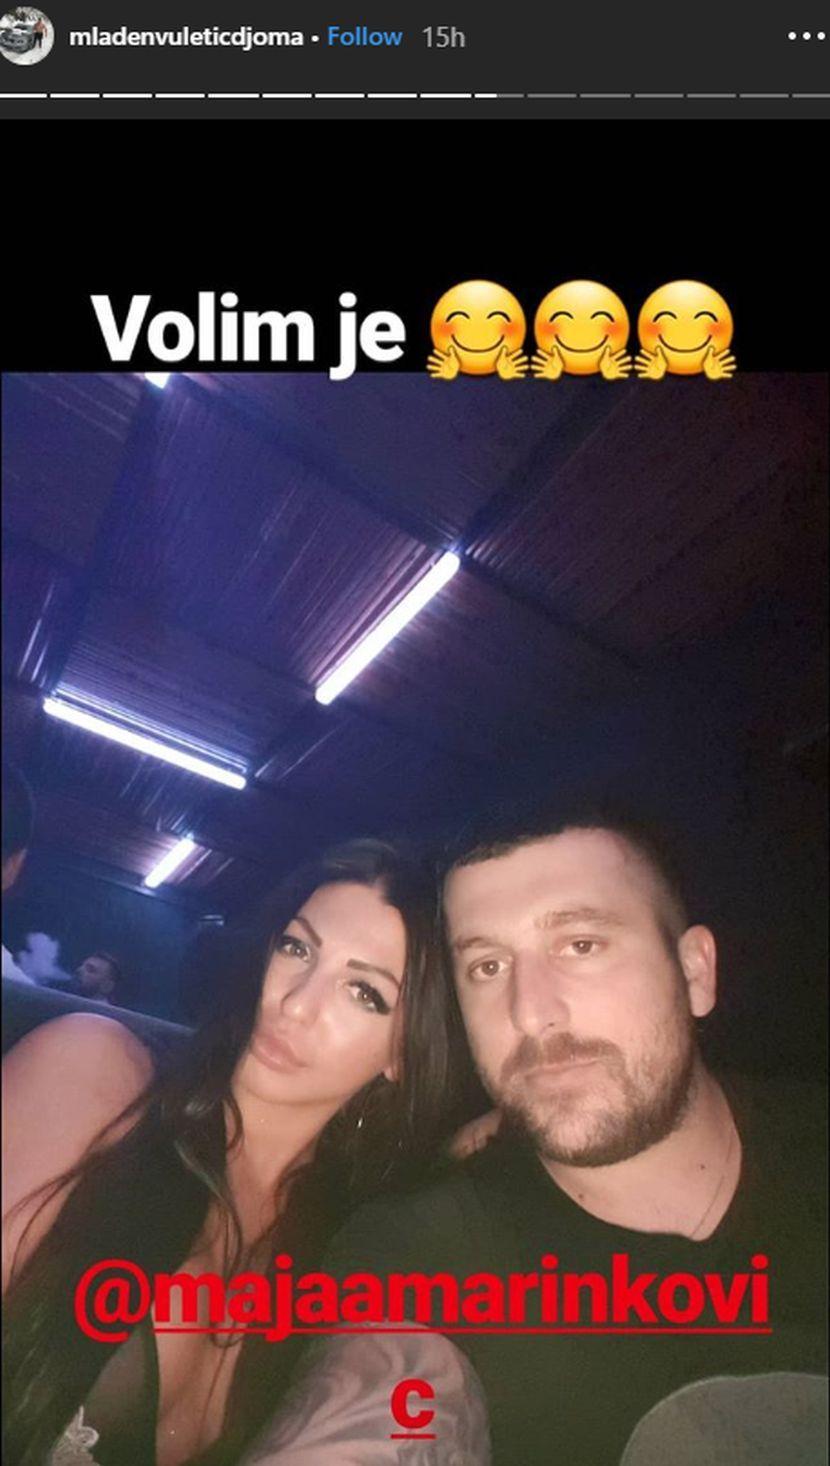 Mladen Vuletić, Maja Marinković